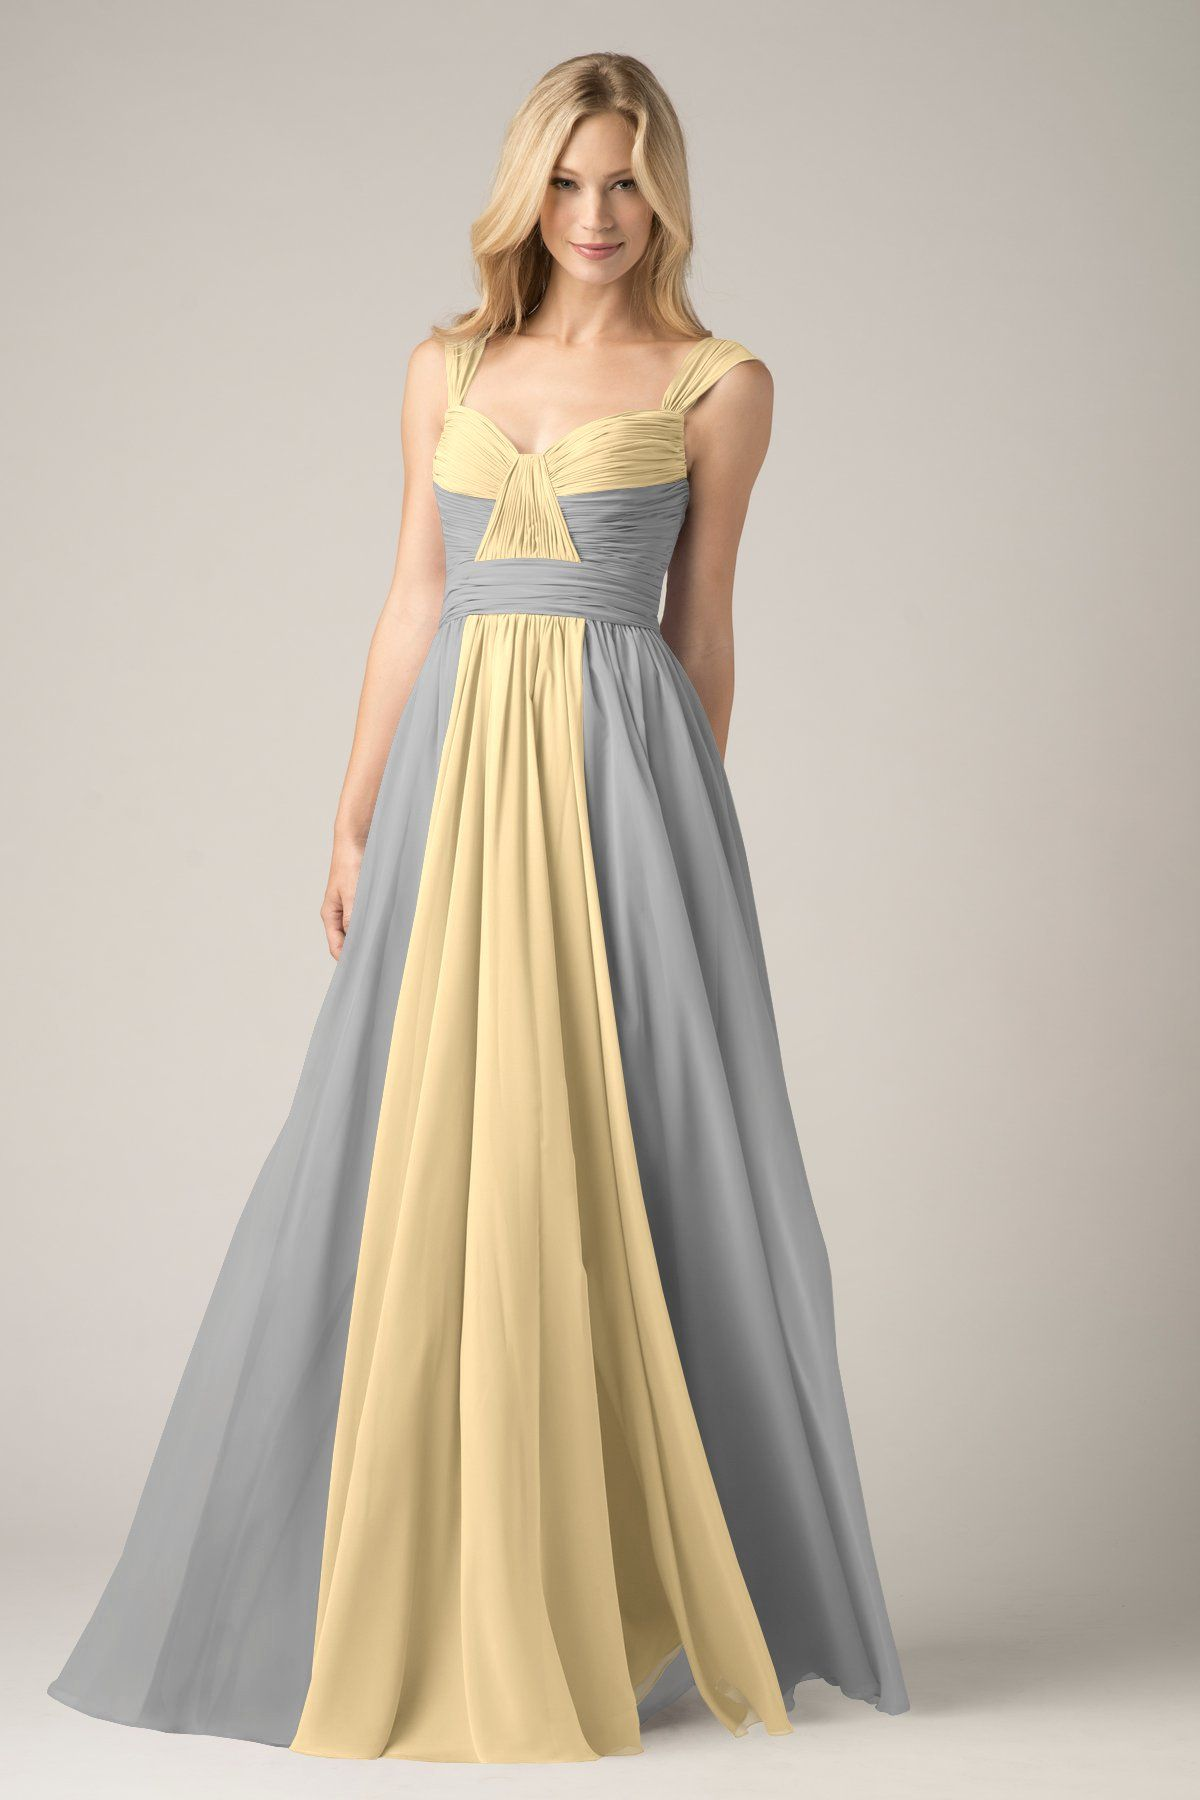 Wtoo maids dress wedding ideas pinterest maids and wedding